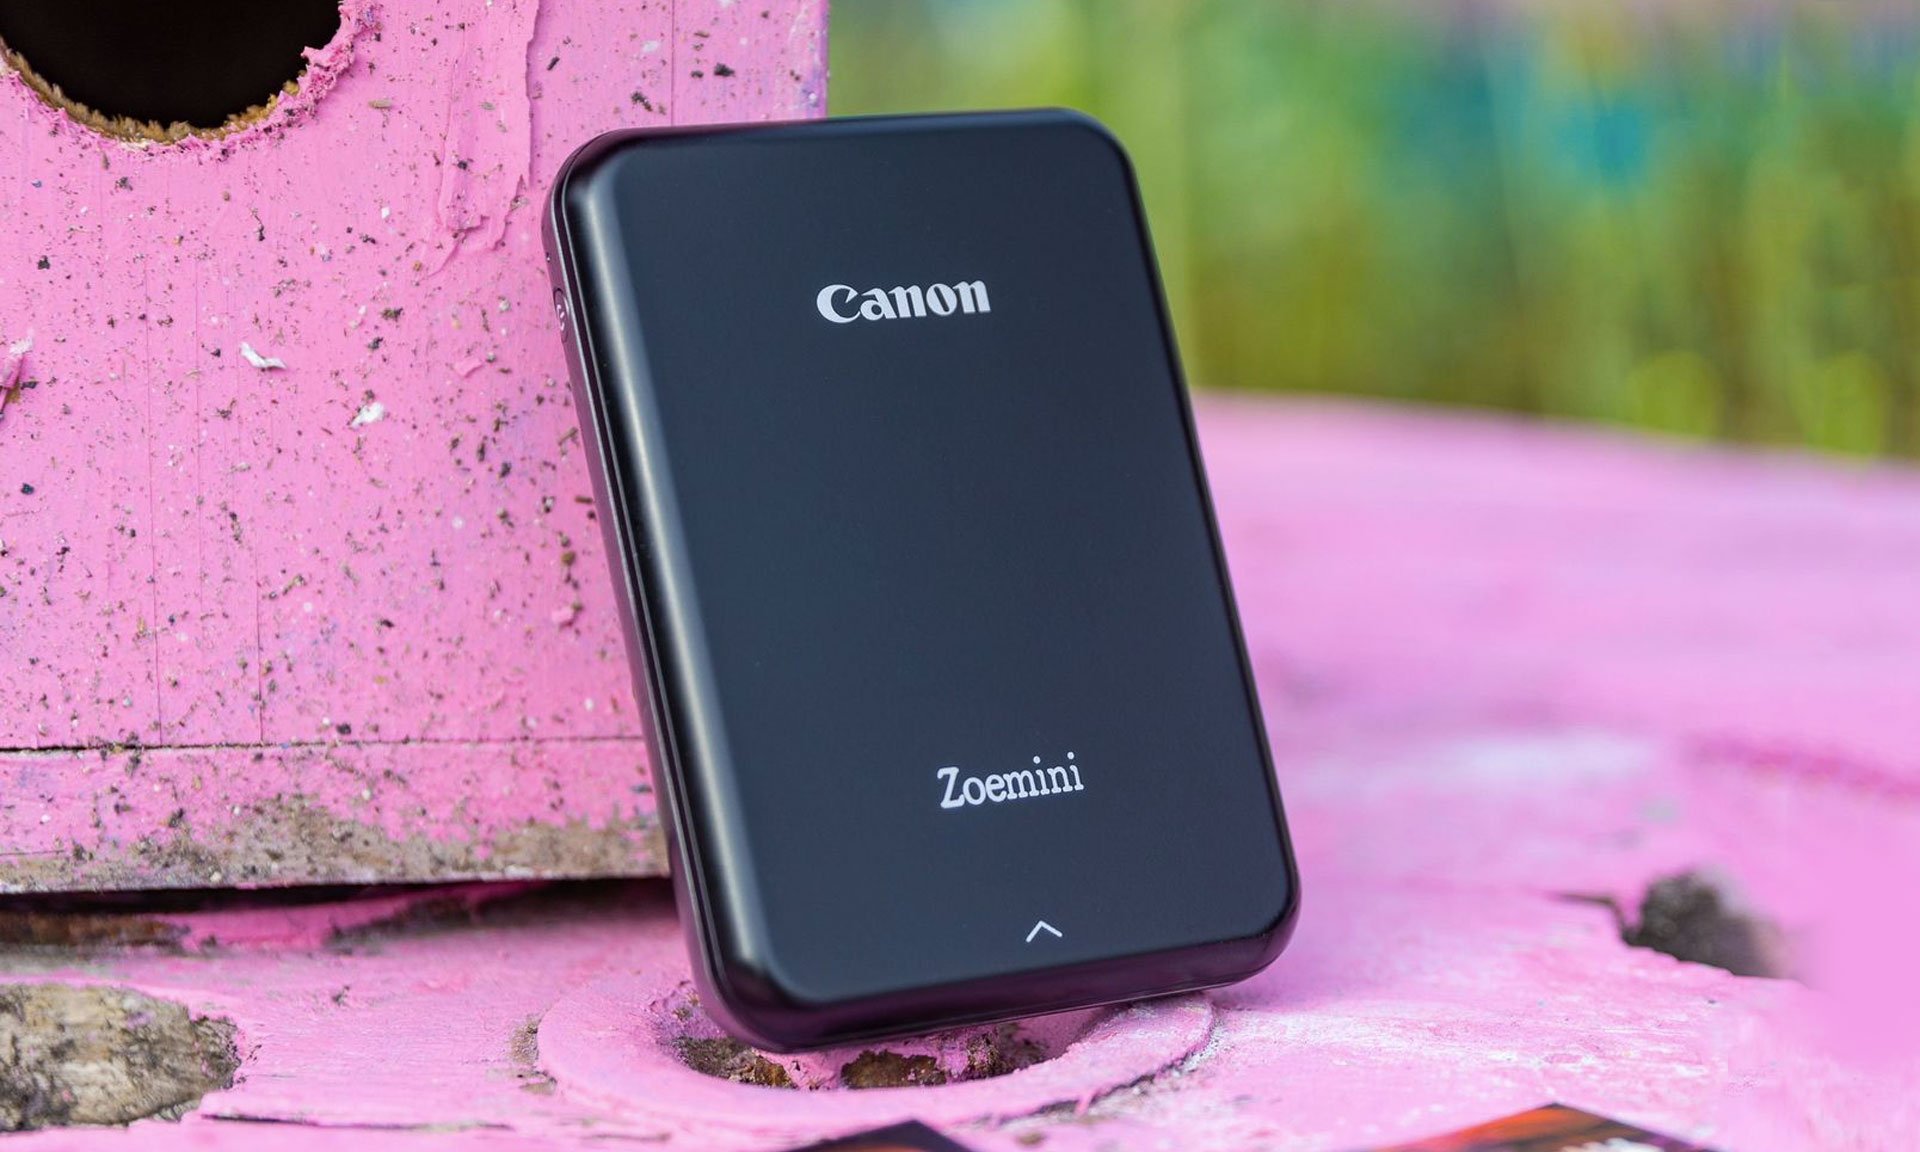 Canon Zoemini Vs Hp Sprocket Battle Of The Portable Photo